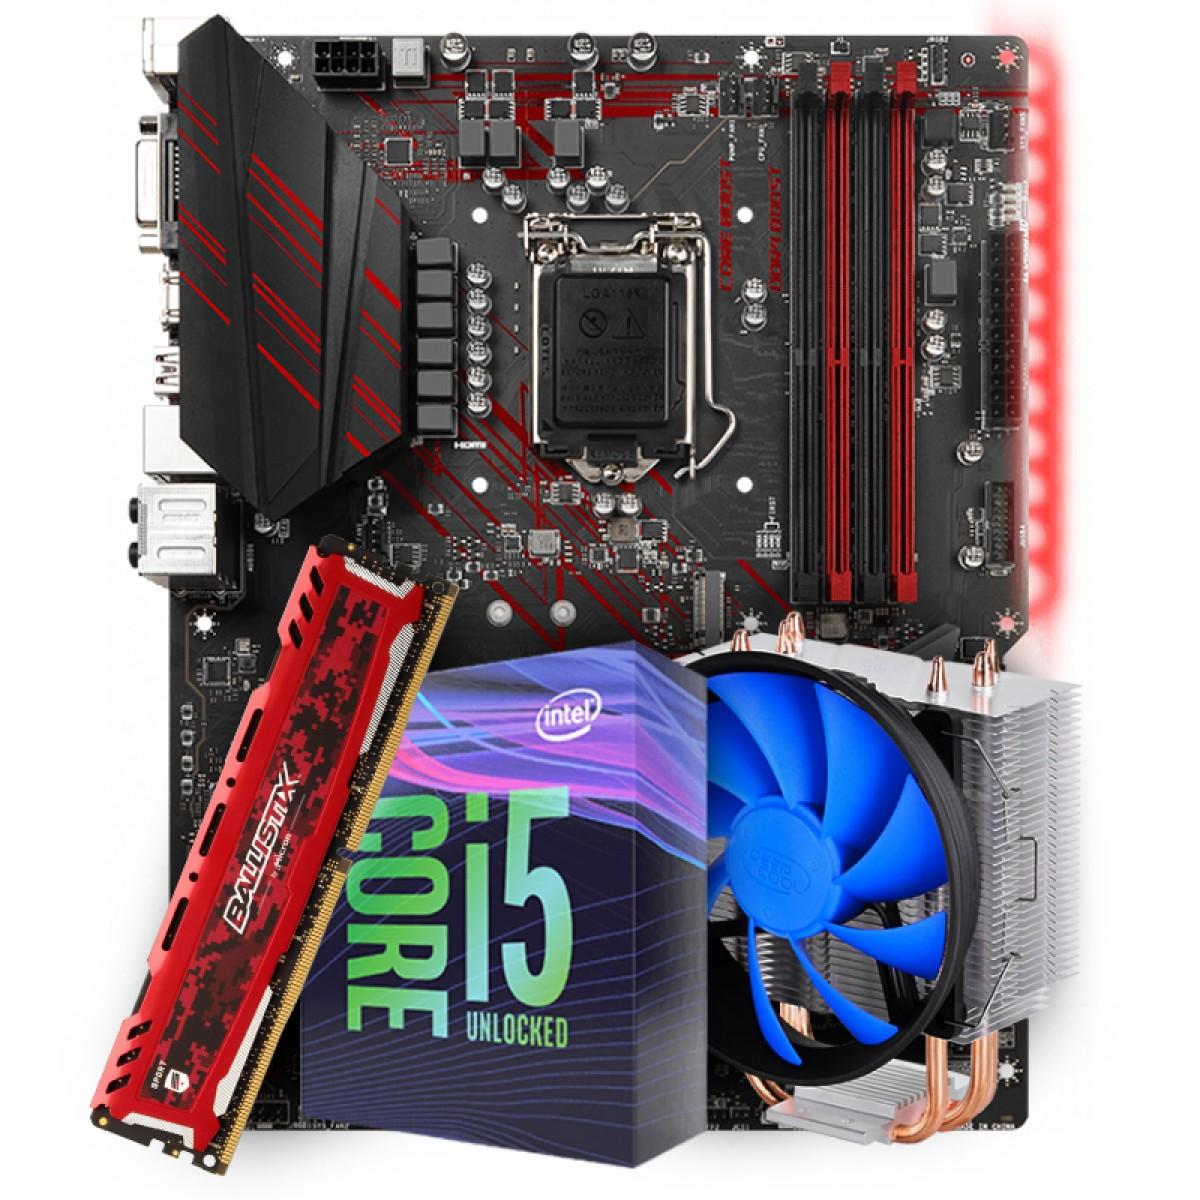 Placa Mãe MSI Z390 Mpg Gaming Plus LGA 1151 + Processador Intel Core i5 9600KF 3.70GHz + Cooler DeepCool Gammaxx 300 + Memória DDR4 16GB 2666MHz